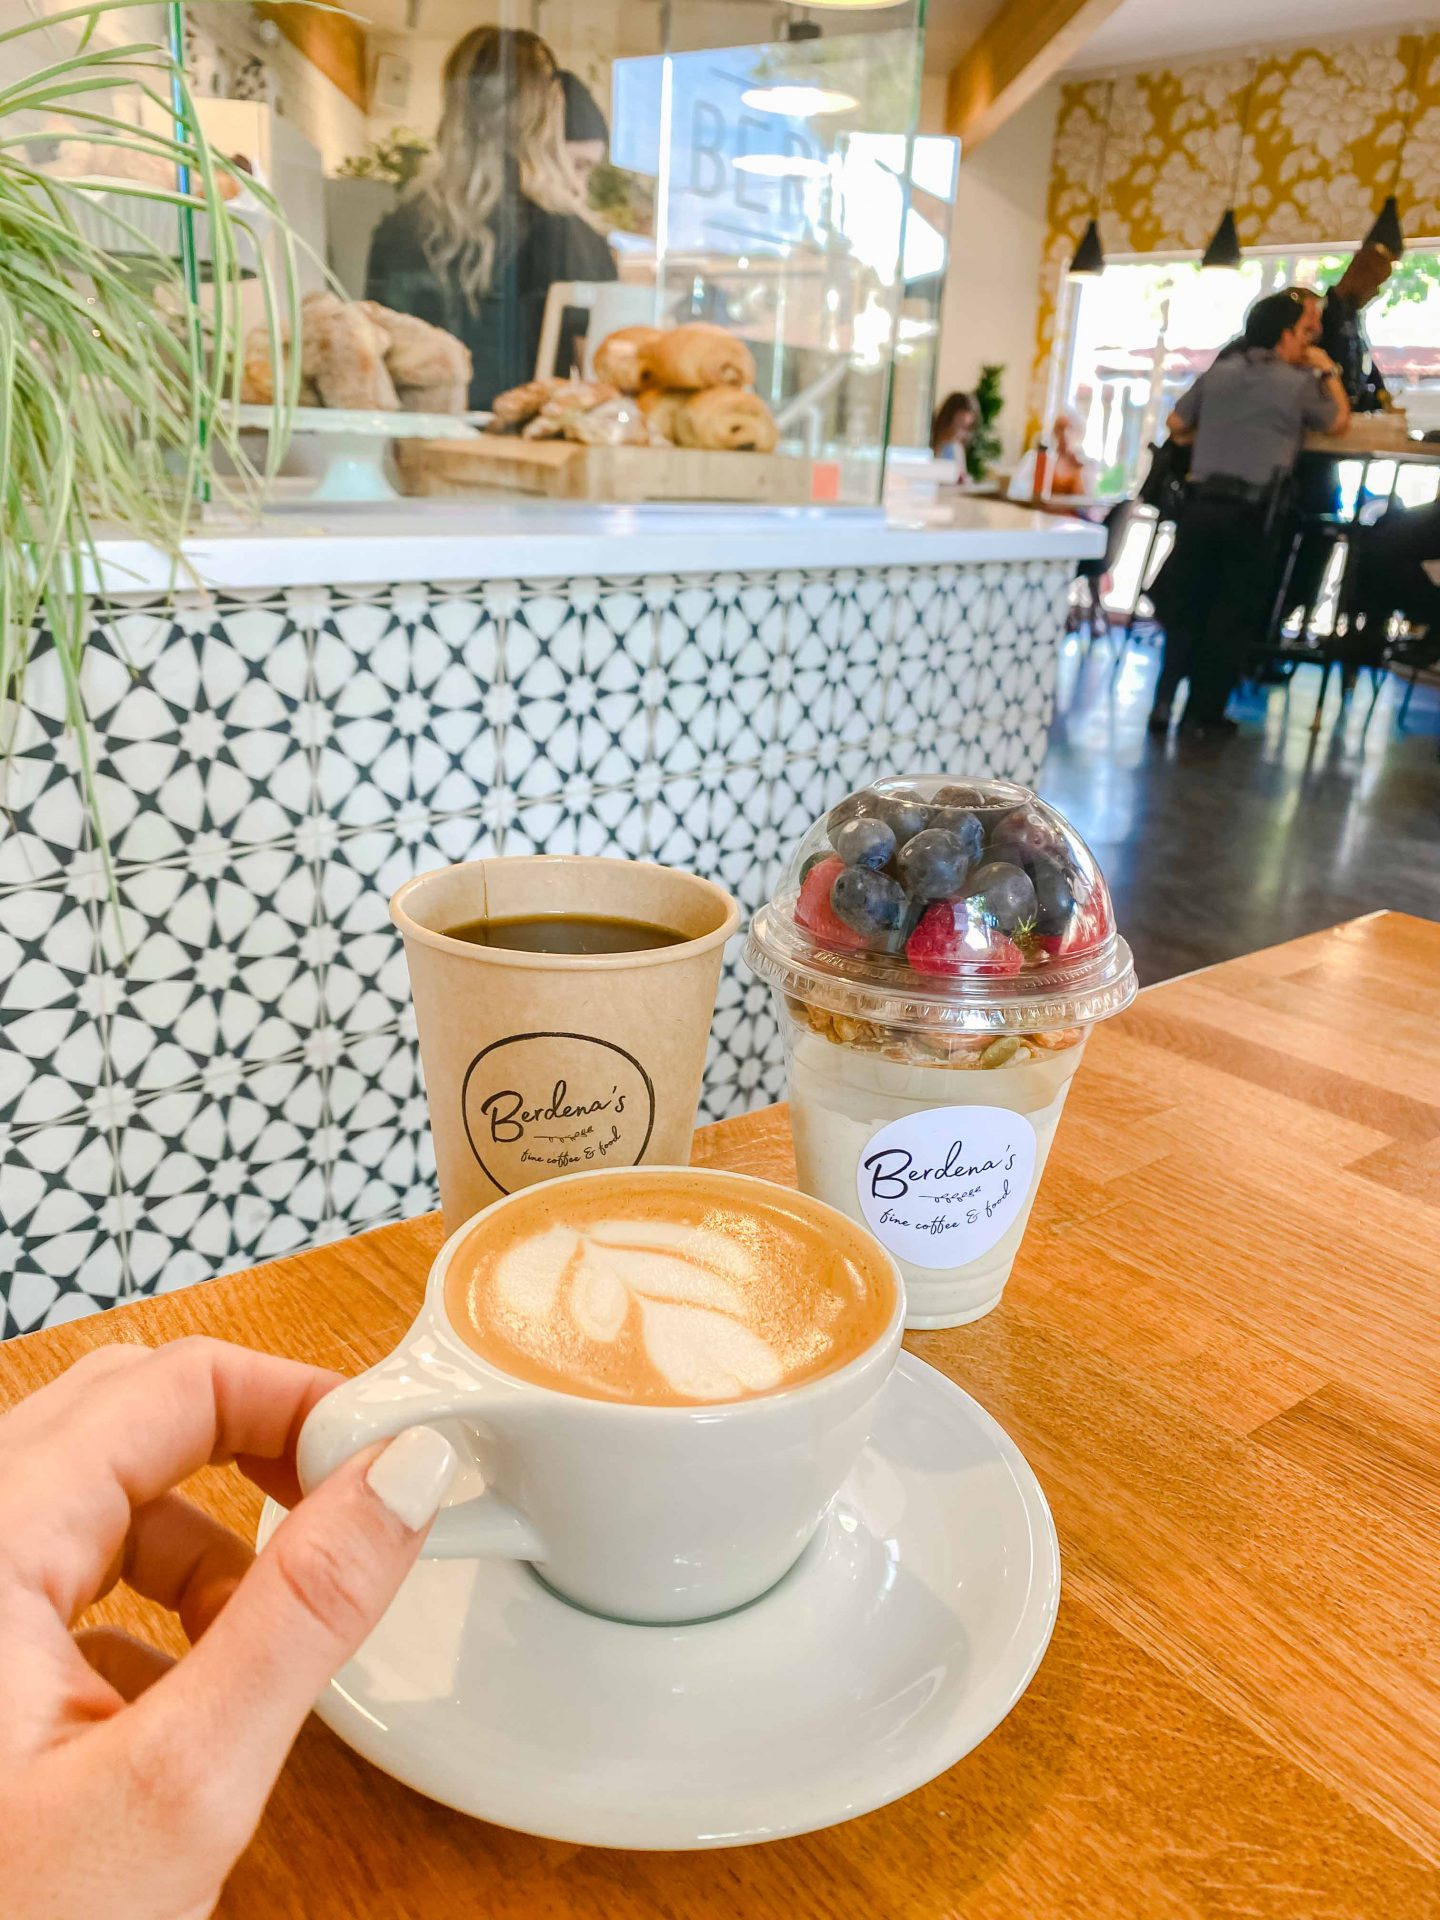 Best coffee shops in Scottsdale Arizona, Berdenas, Ultimate guide to scottsdale Arizona, travel blog, scottsdale travel, blogger, what to eat in scottsdale, what to do in scottsdale, coffee shop vibes, honeymoon, oat milk latte, yogurt parfait, old town scottsdale